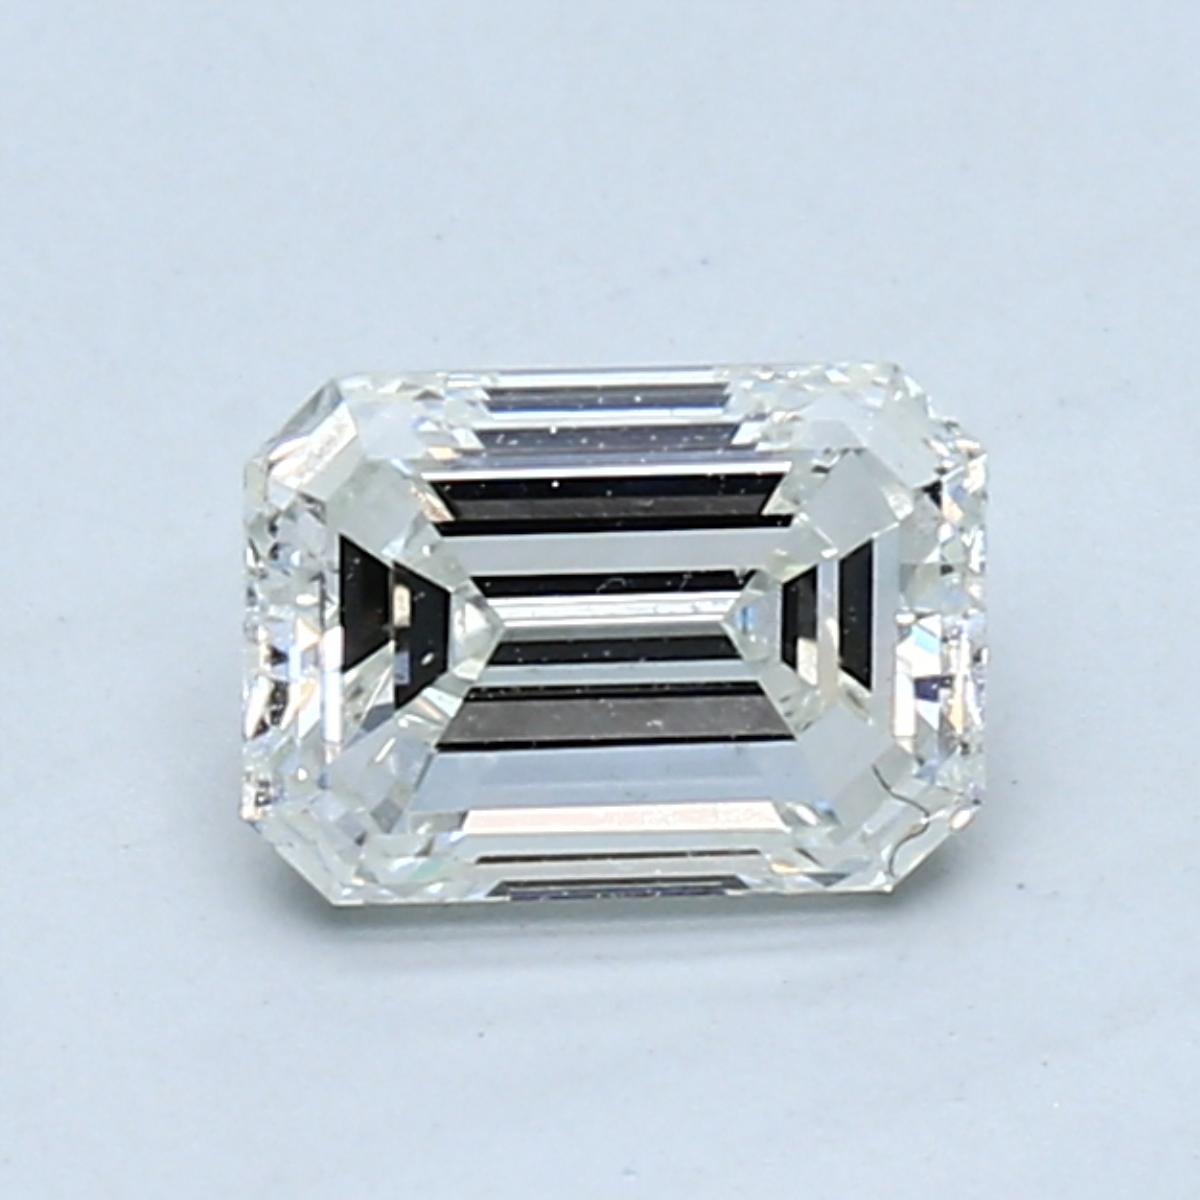 1.00 carat Emerald Diamond, Very Good cut, graded by the GIA laboratories.